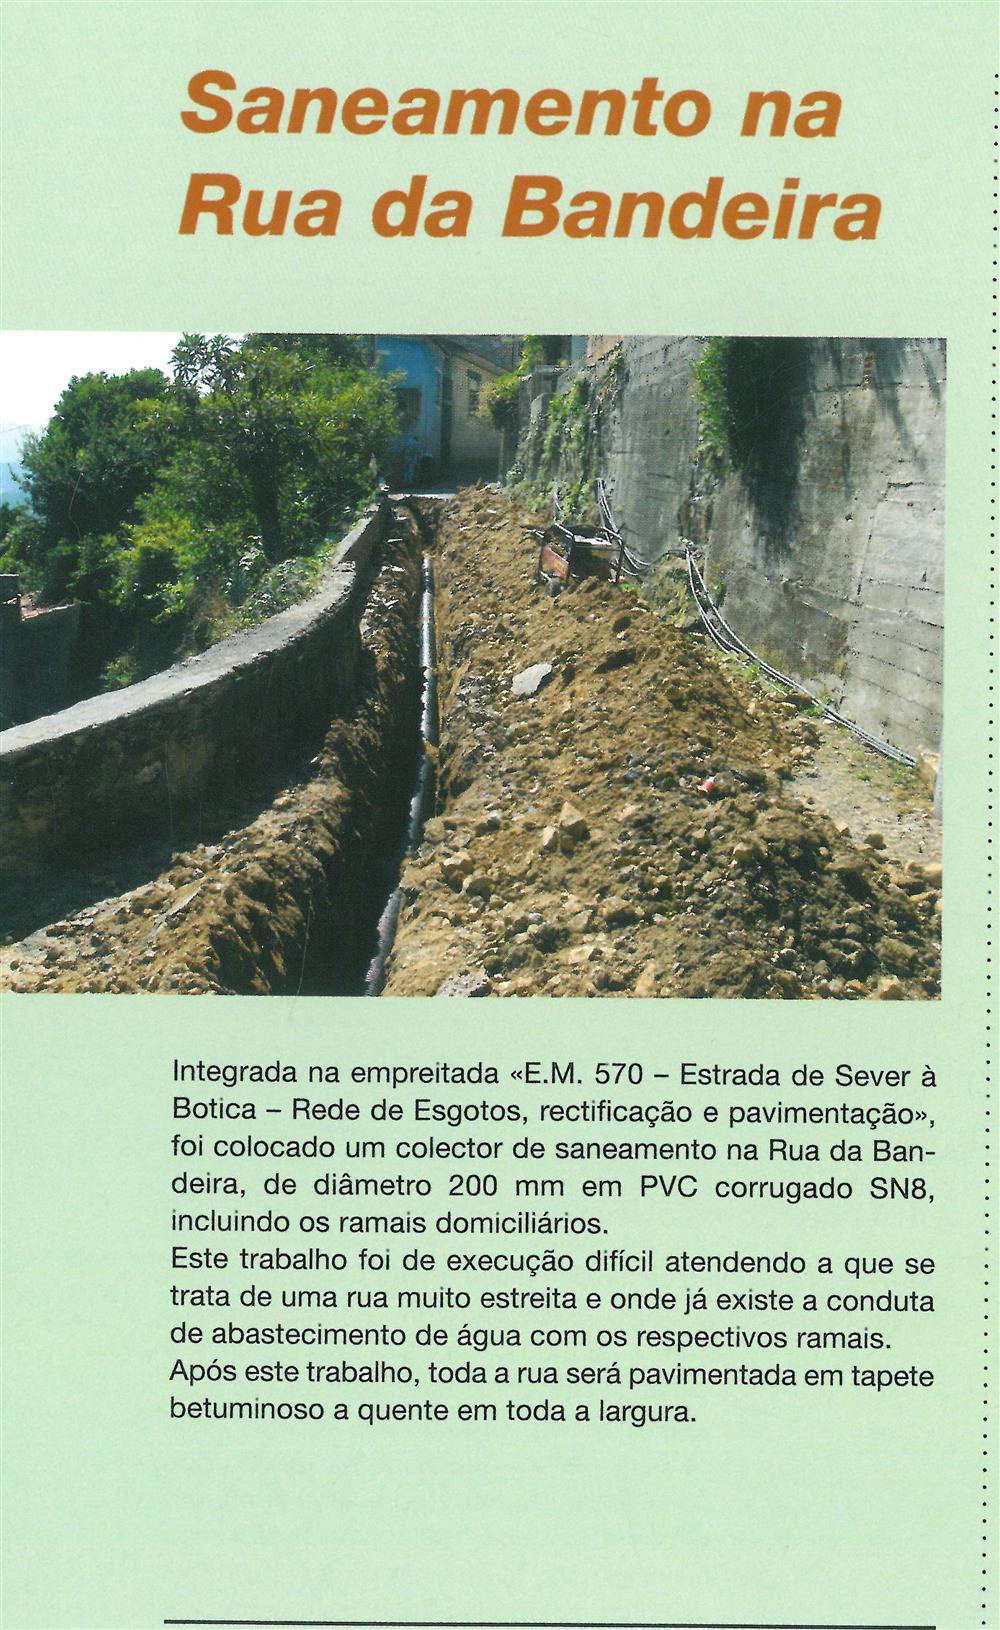 BoletimMunicipal-n.º 20-set.'06-p.62-Parques, jardins e espaços verdes : saneamento na Rua da Bandeira.jpg